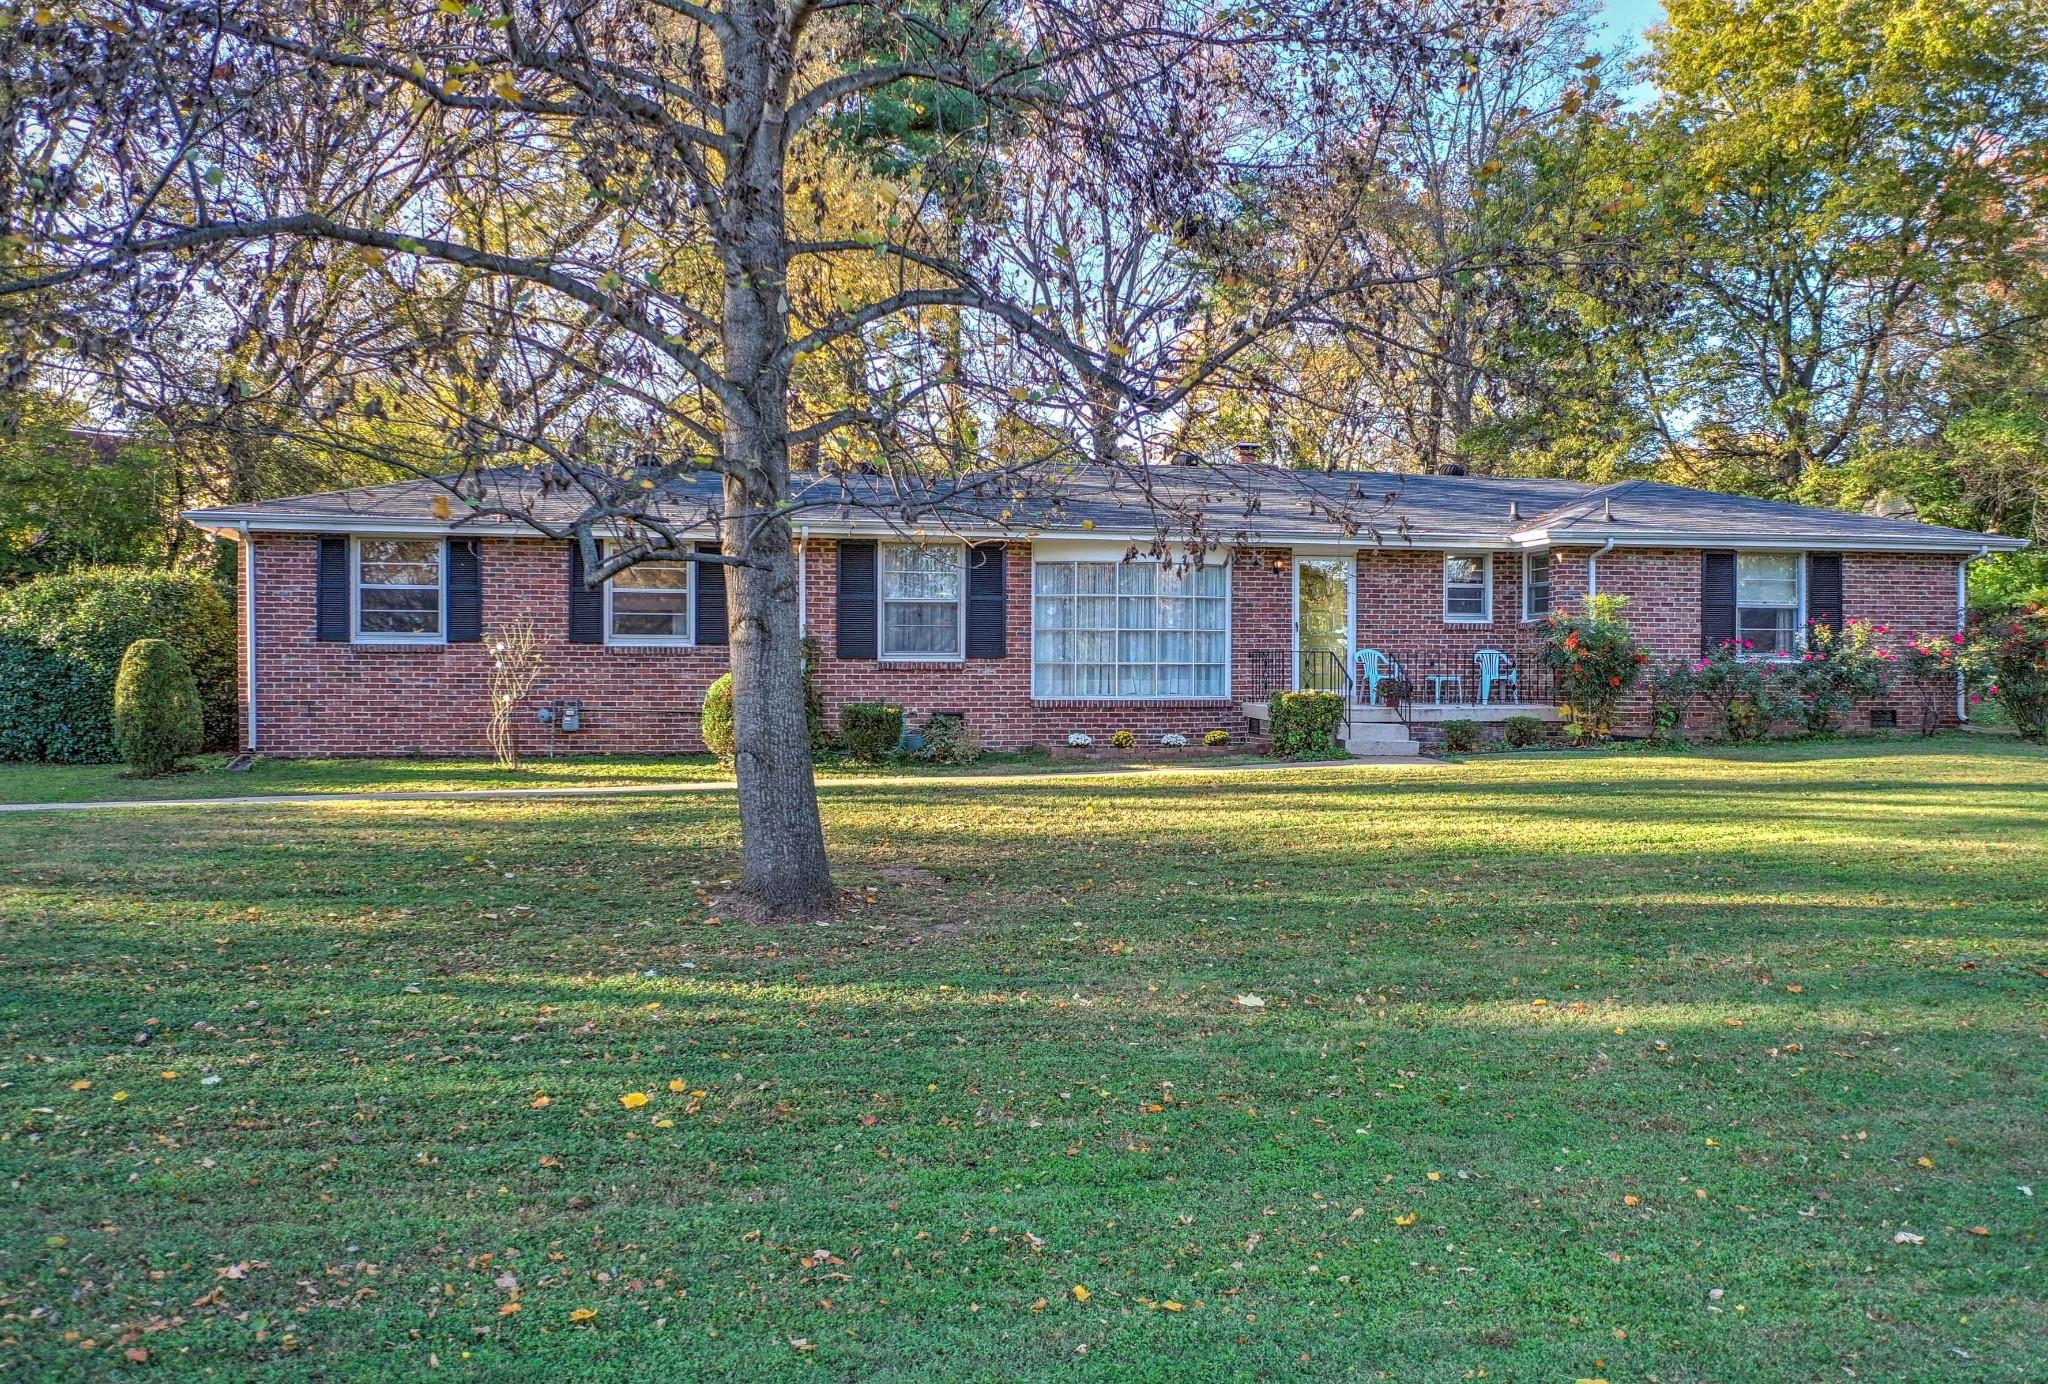 413 Foothill Dr Property Photo - Nashville, TN real estate listing